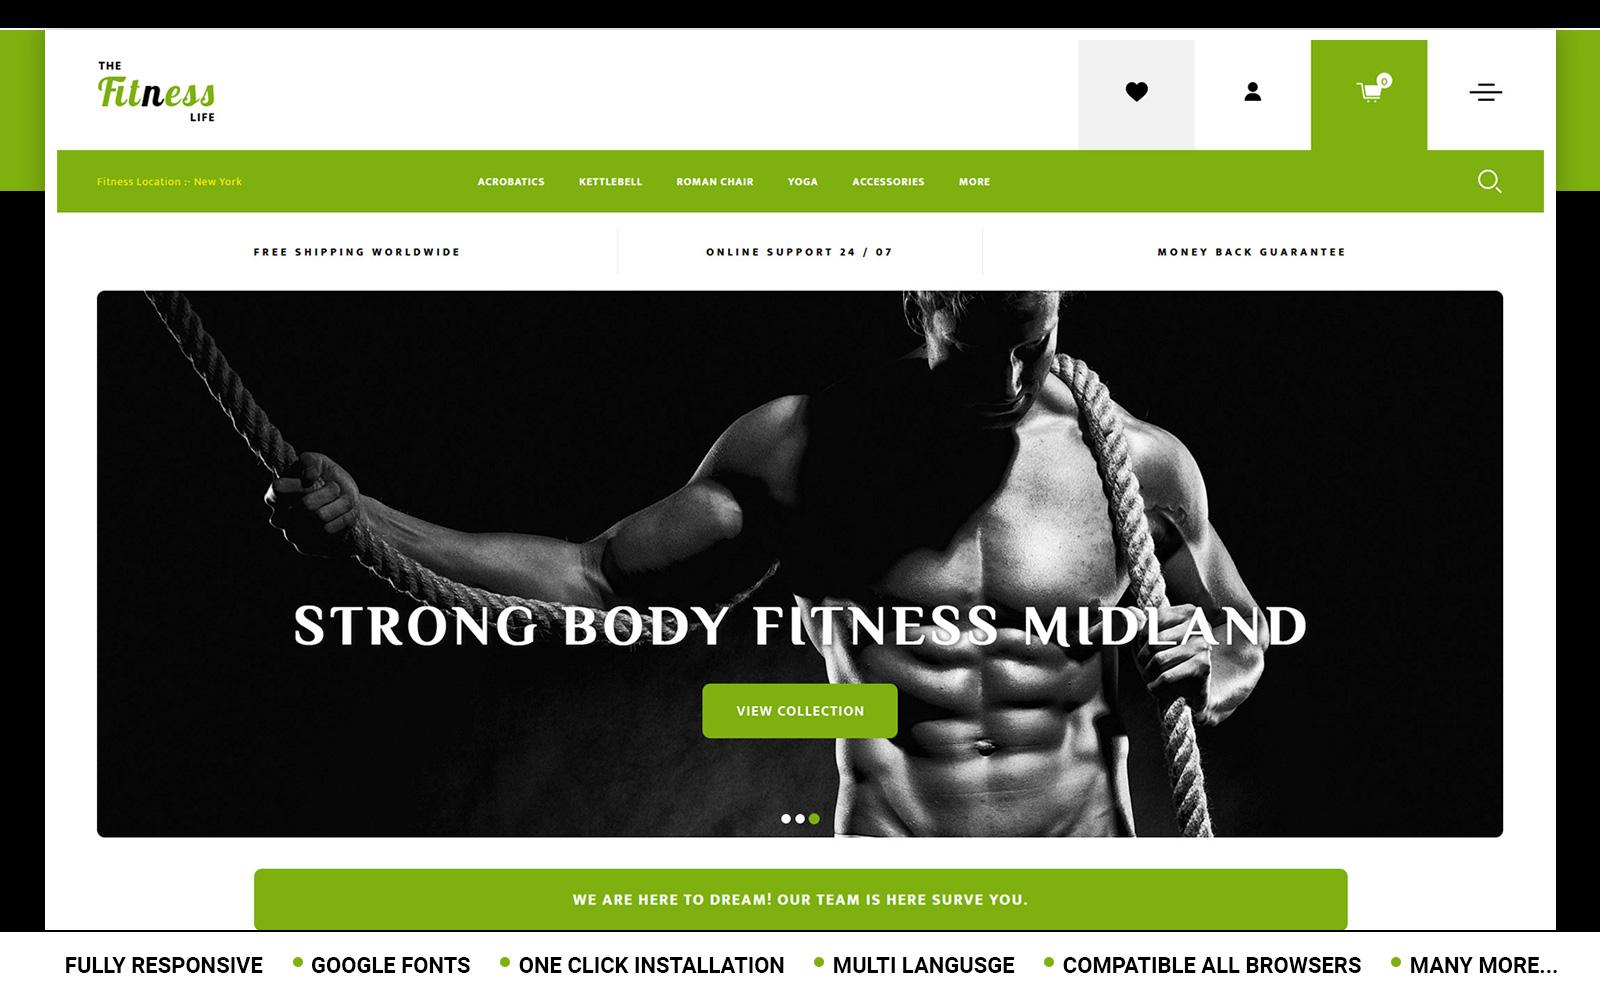 Fitnesslife - Beauty Store OpenCart Template